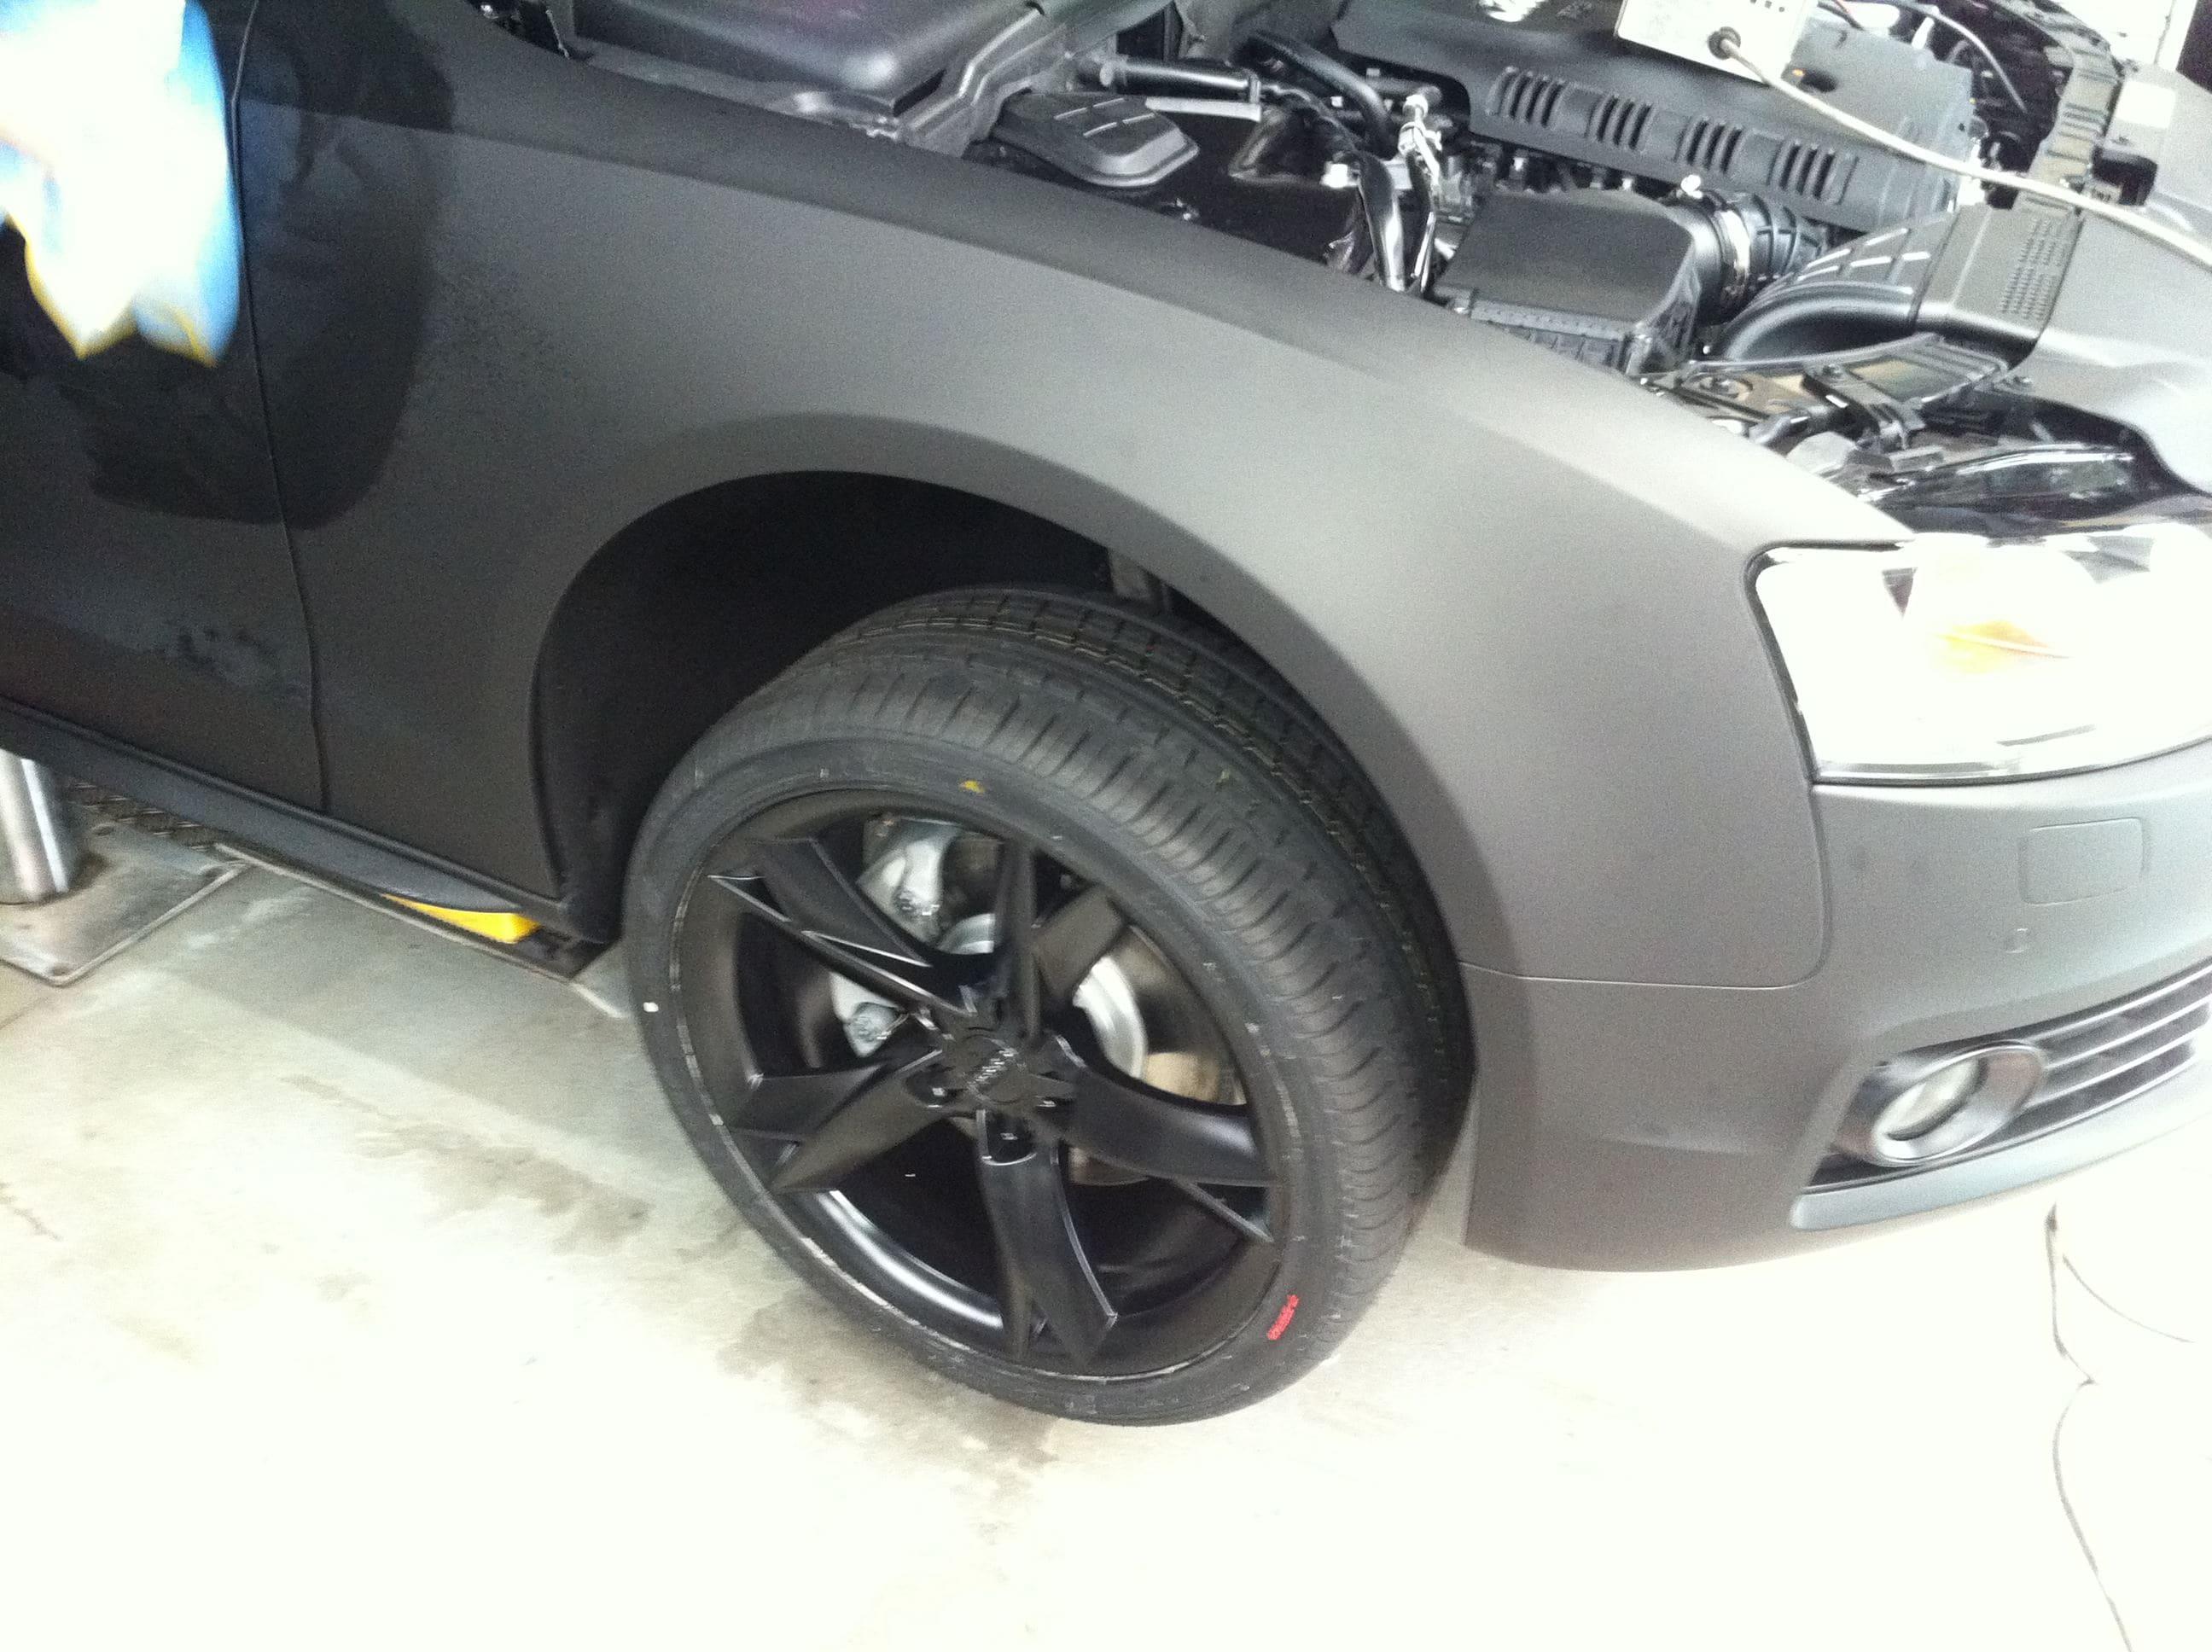 Audi A5 Coupe met Mat Zwarte Wrap, Carwrapping door Wrapmyride.nu Foto-nr:4590, ©2021